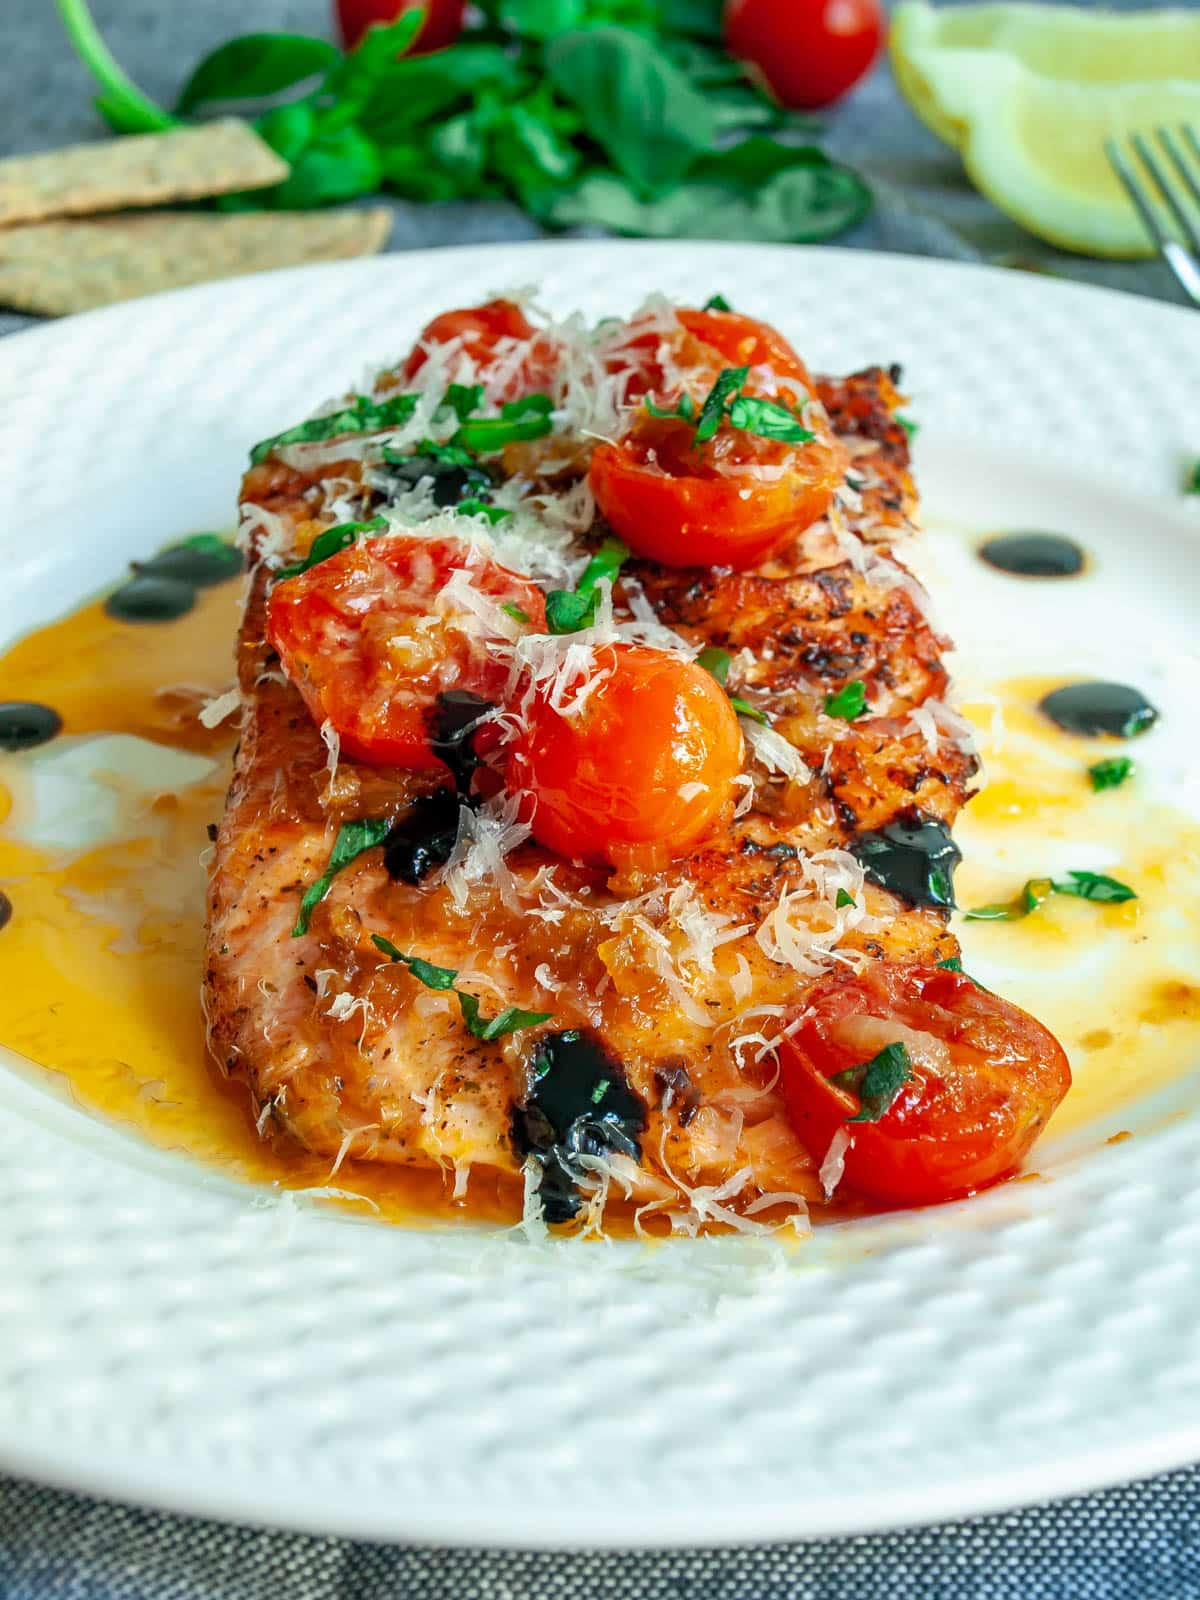 bruschetta salmon fillet on a white plate